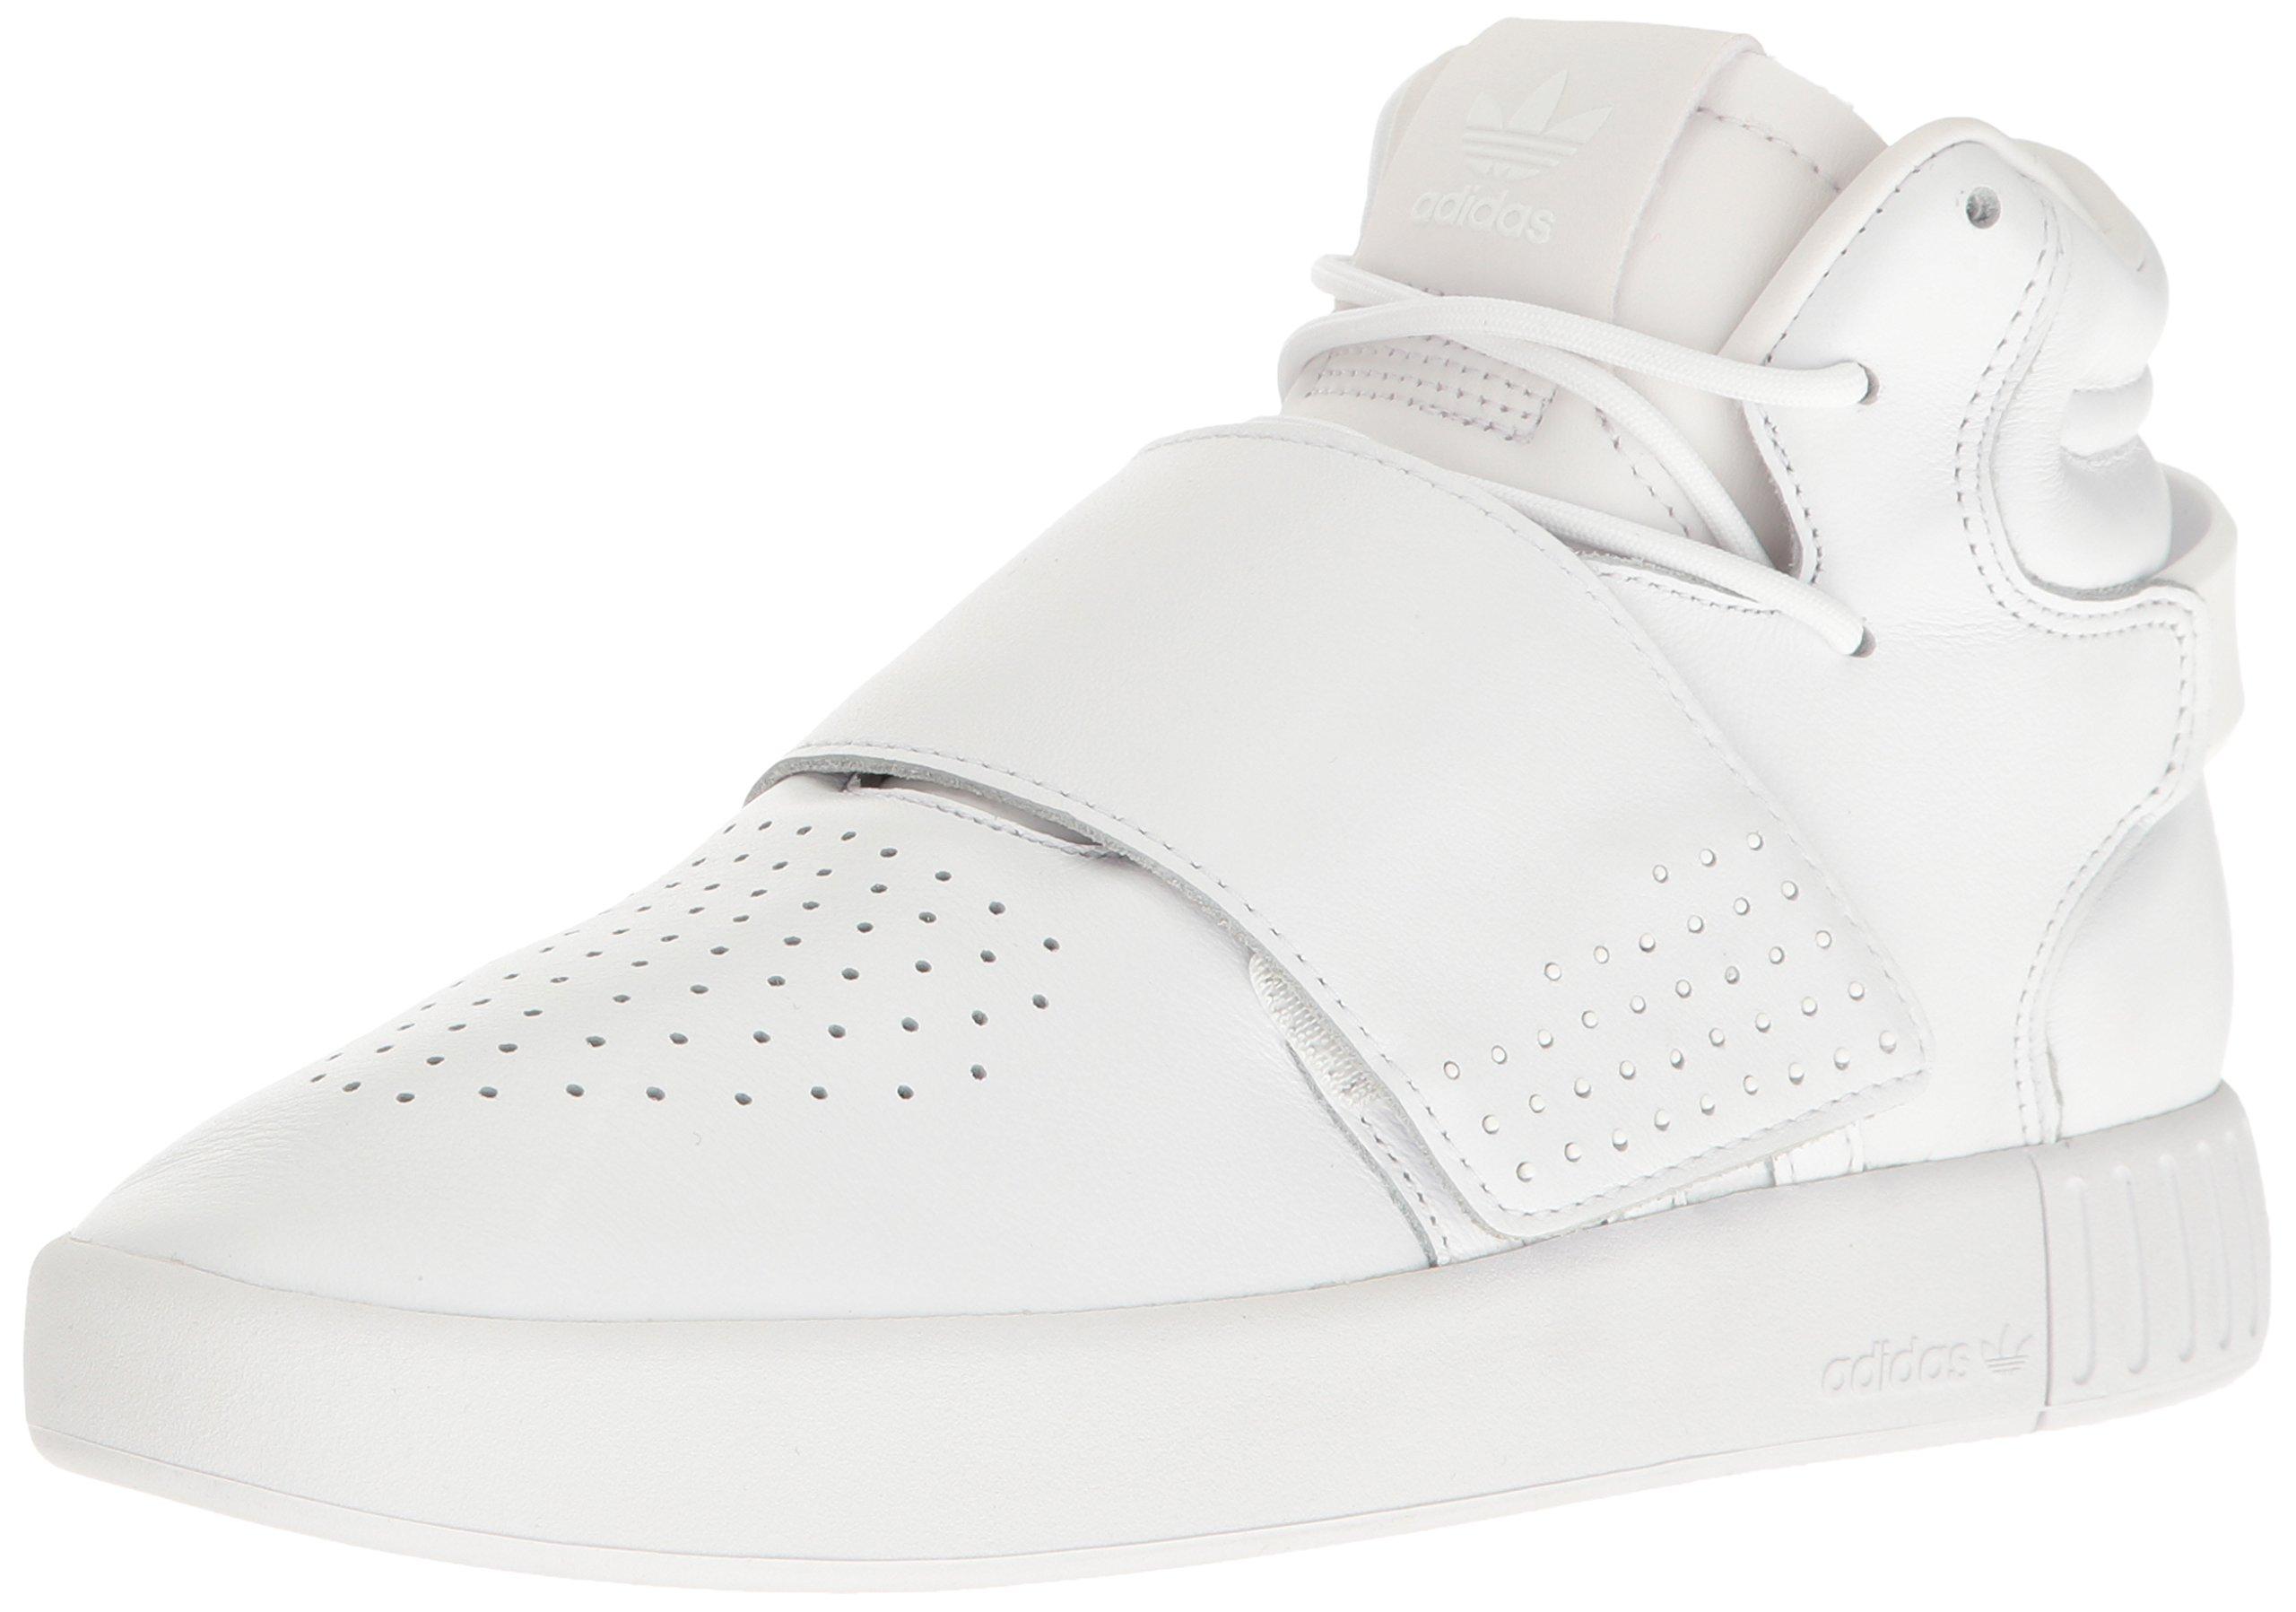 more photos 62e43 598b0 Galleon - Adidas Originals Men s Tubular Invader Strap Fashion Running Shoe,  White, (11.5 M US)